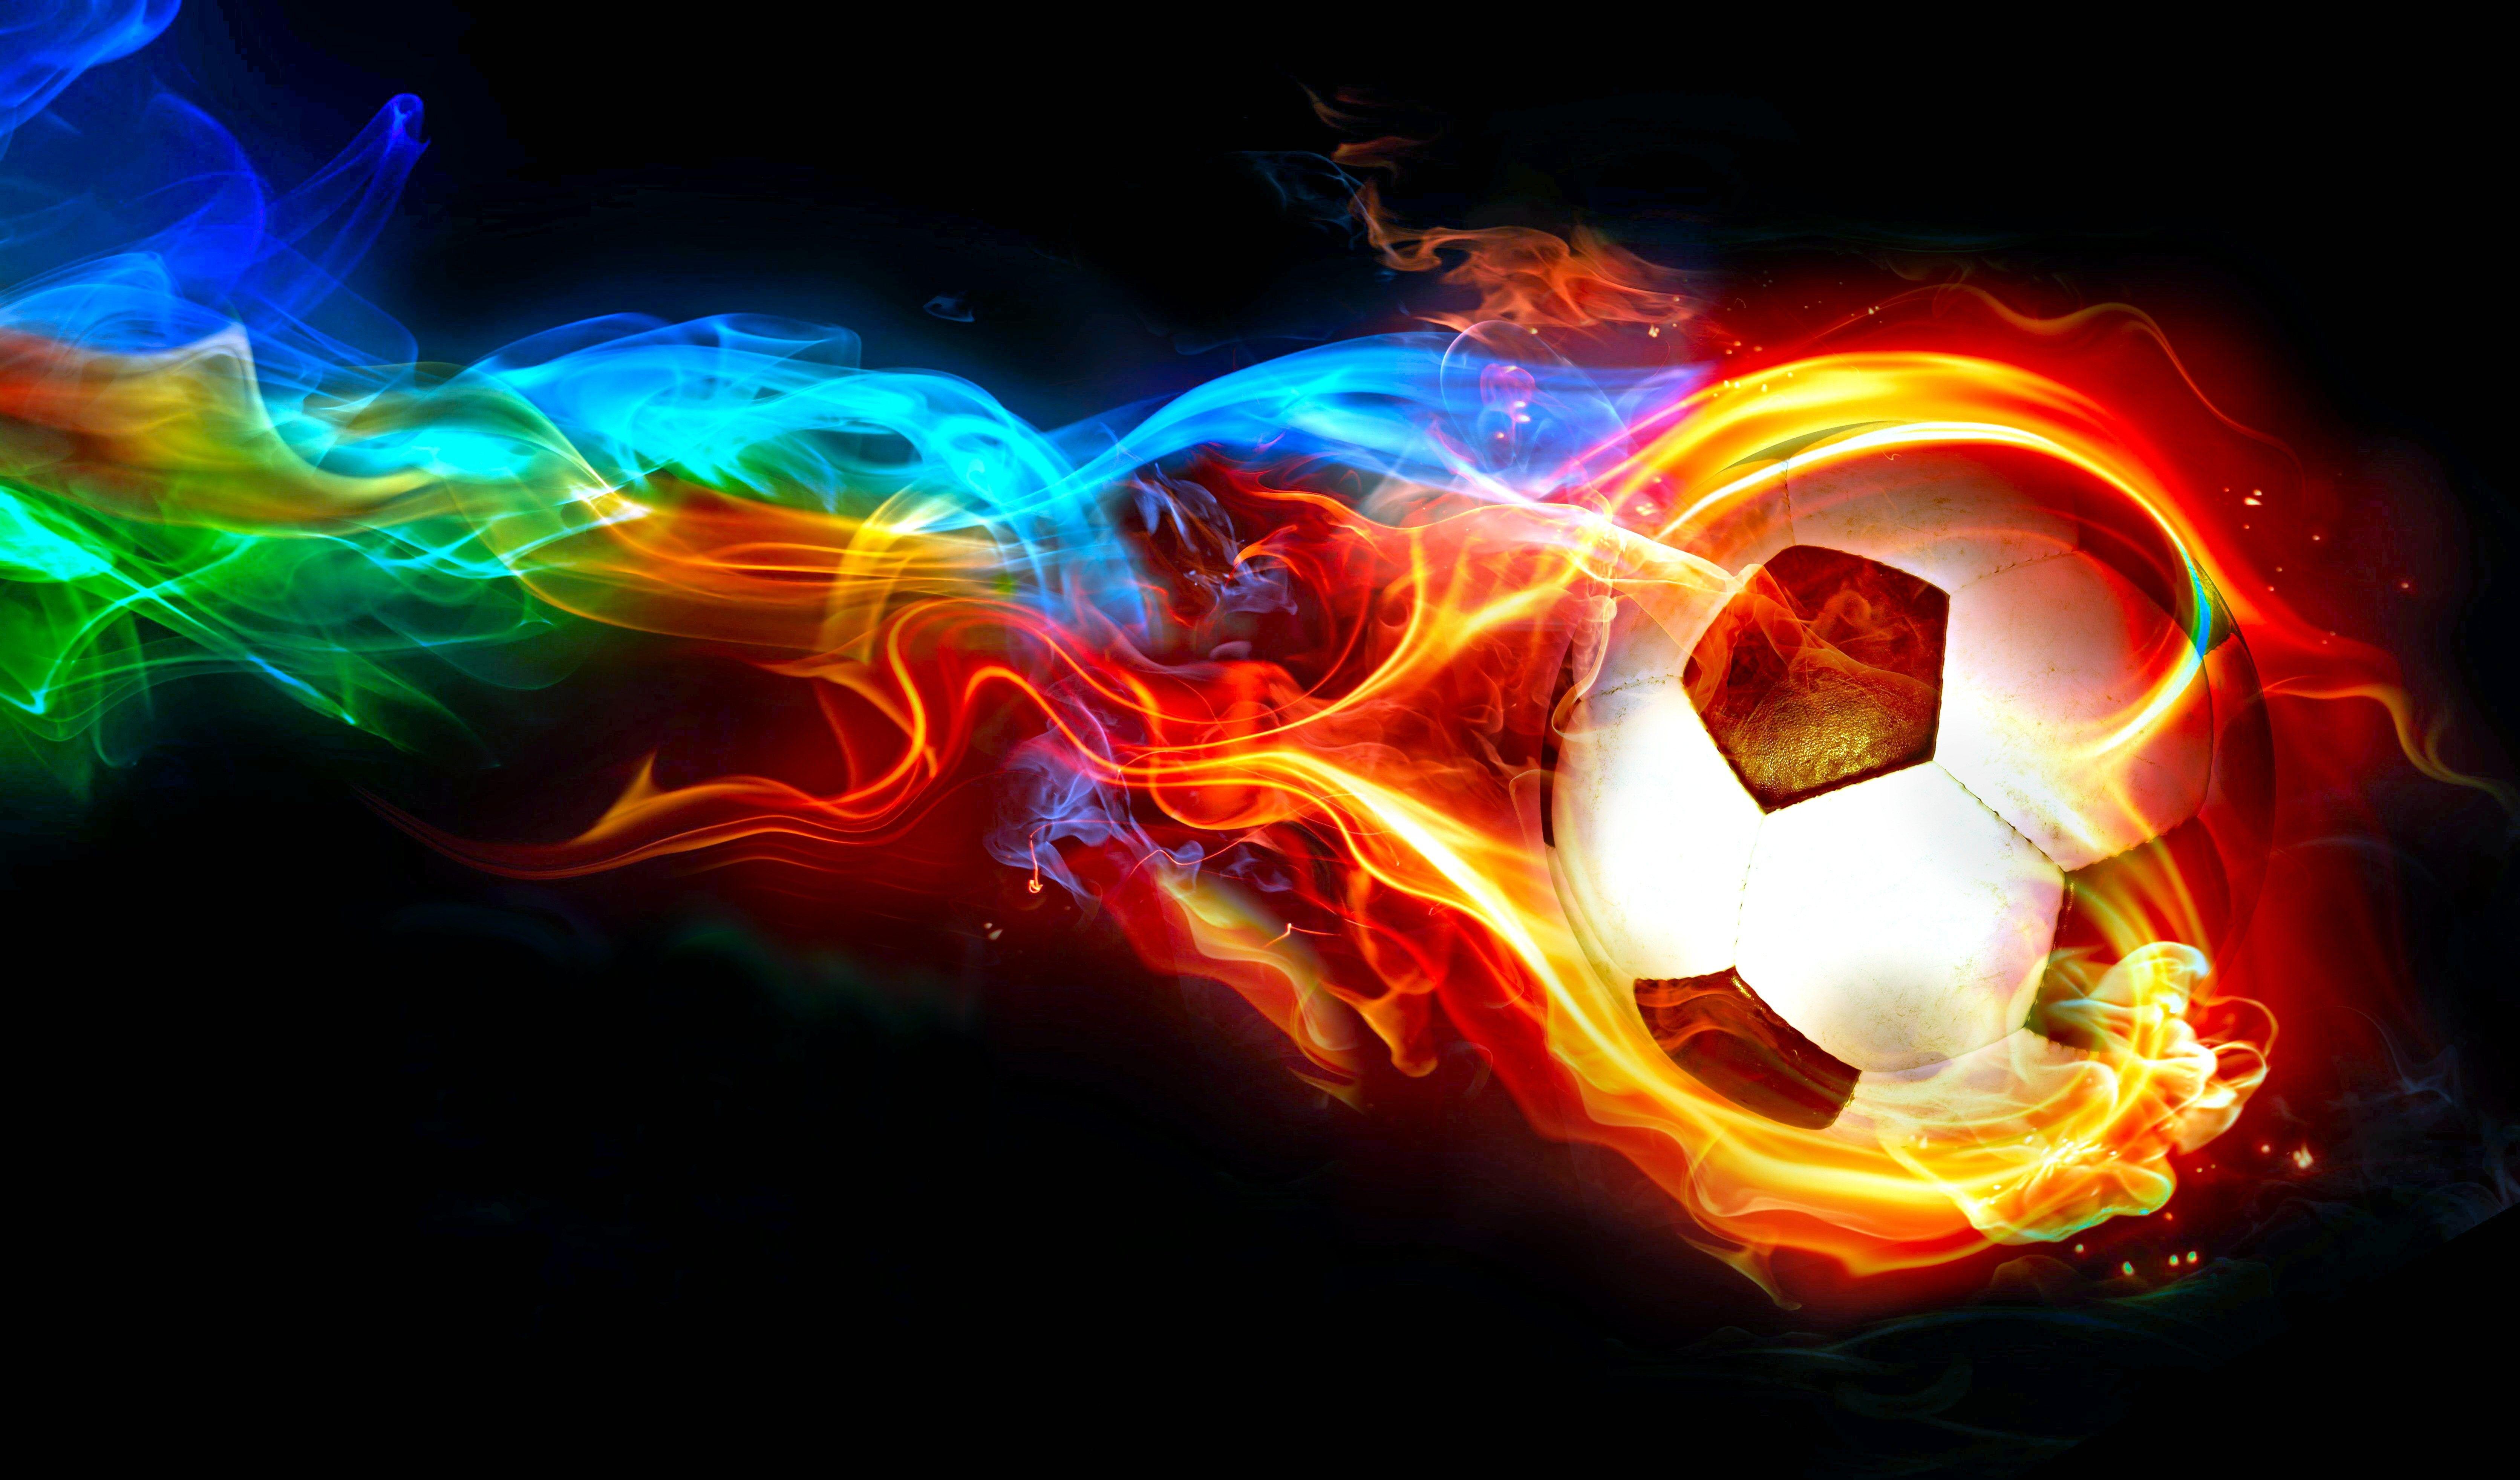 Wallpapers Light Orange Neon Graphics Brazil National Football Team Soccer Ball Soccer Backgrounds Soccer Pictures